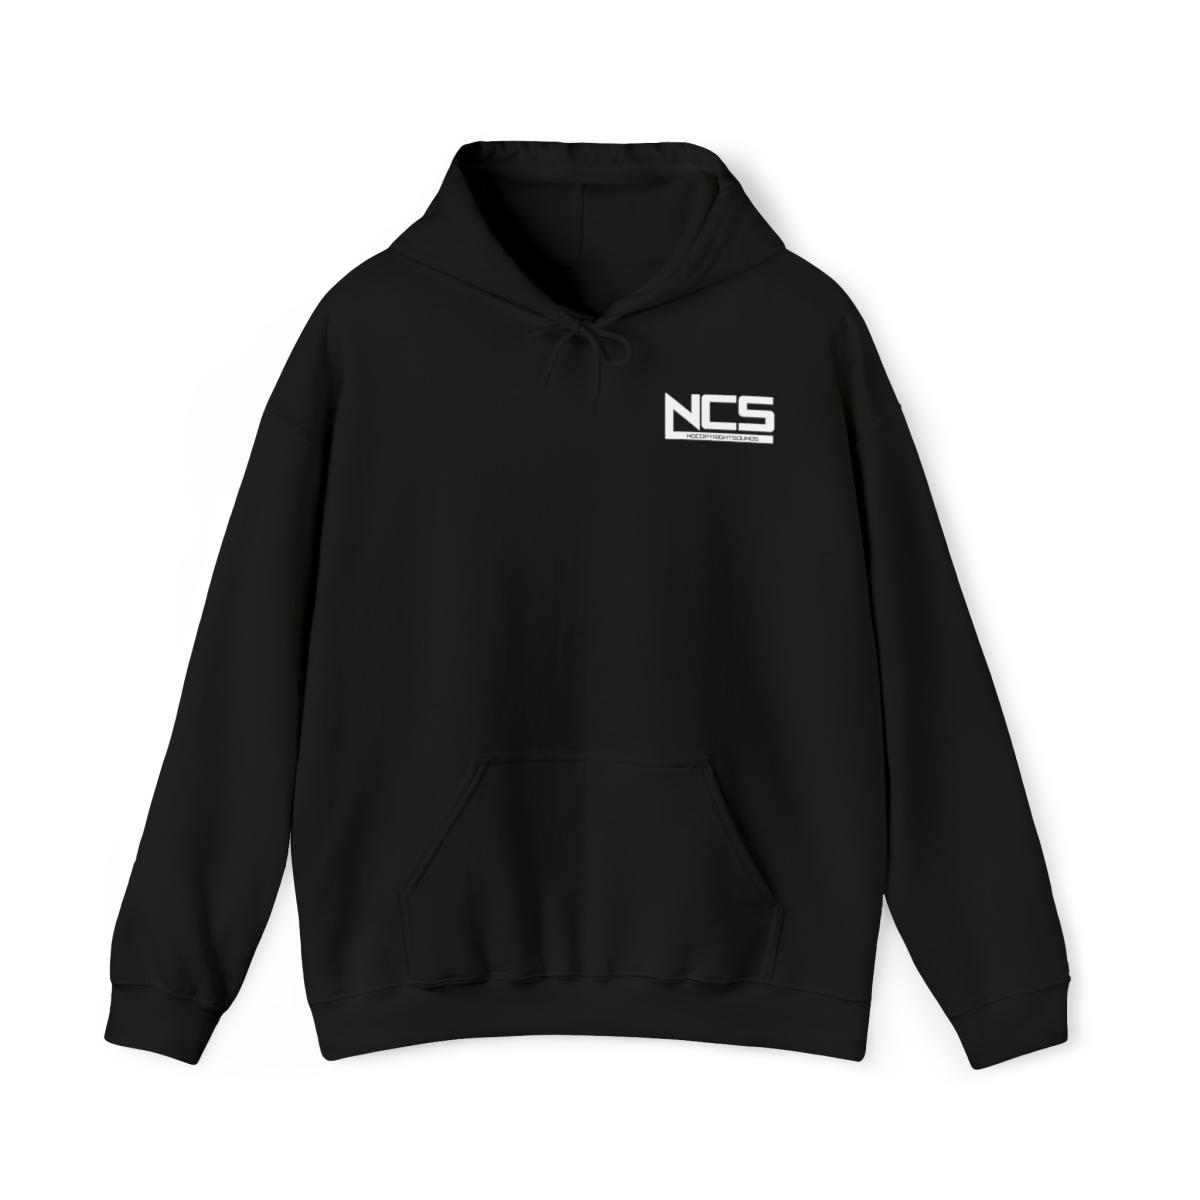 Official NCS Hoodie - Black